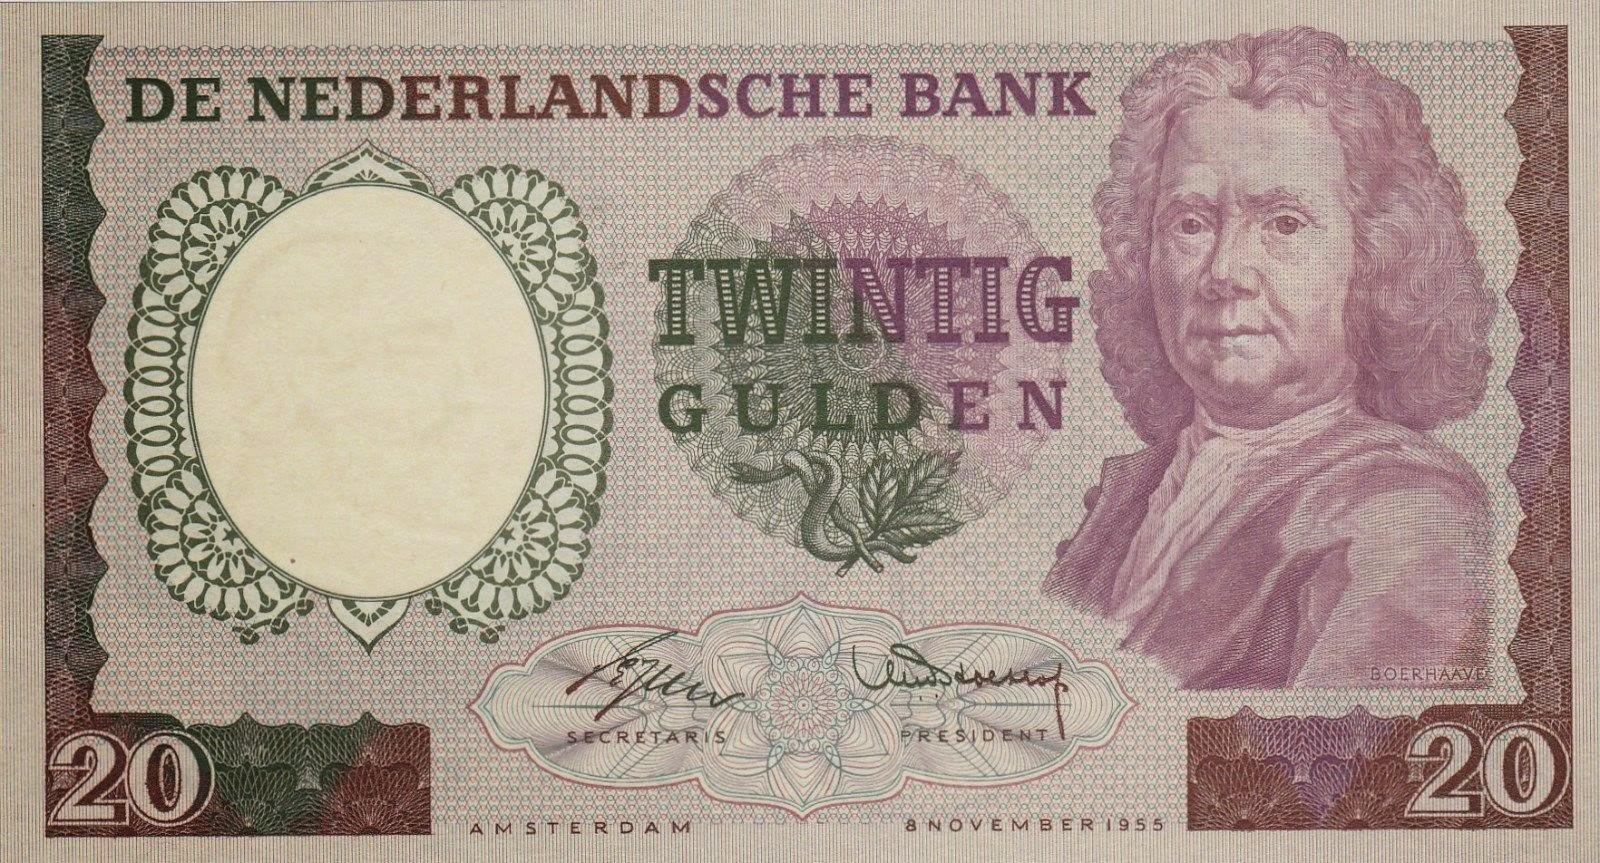 netherlands 20 gulden banknote 1955 herman boerhaave